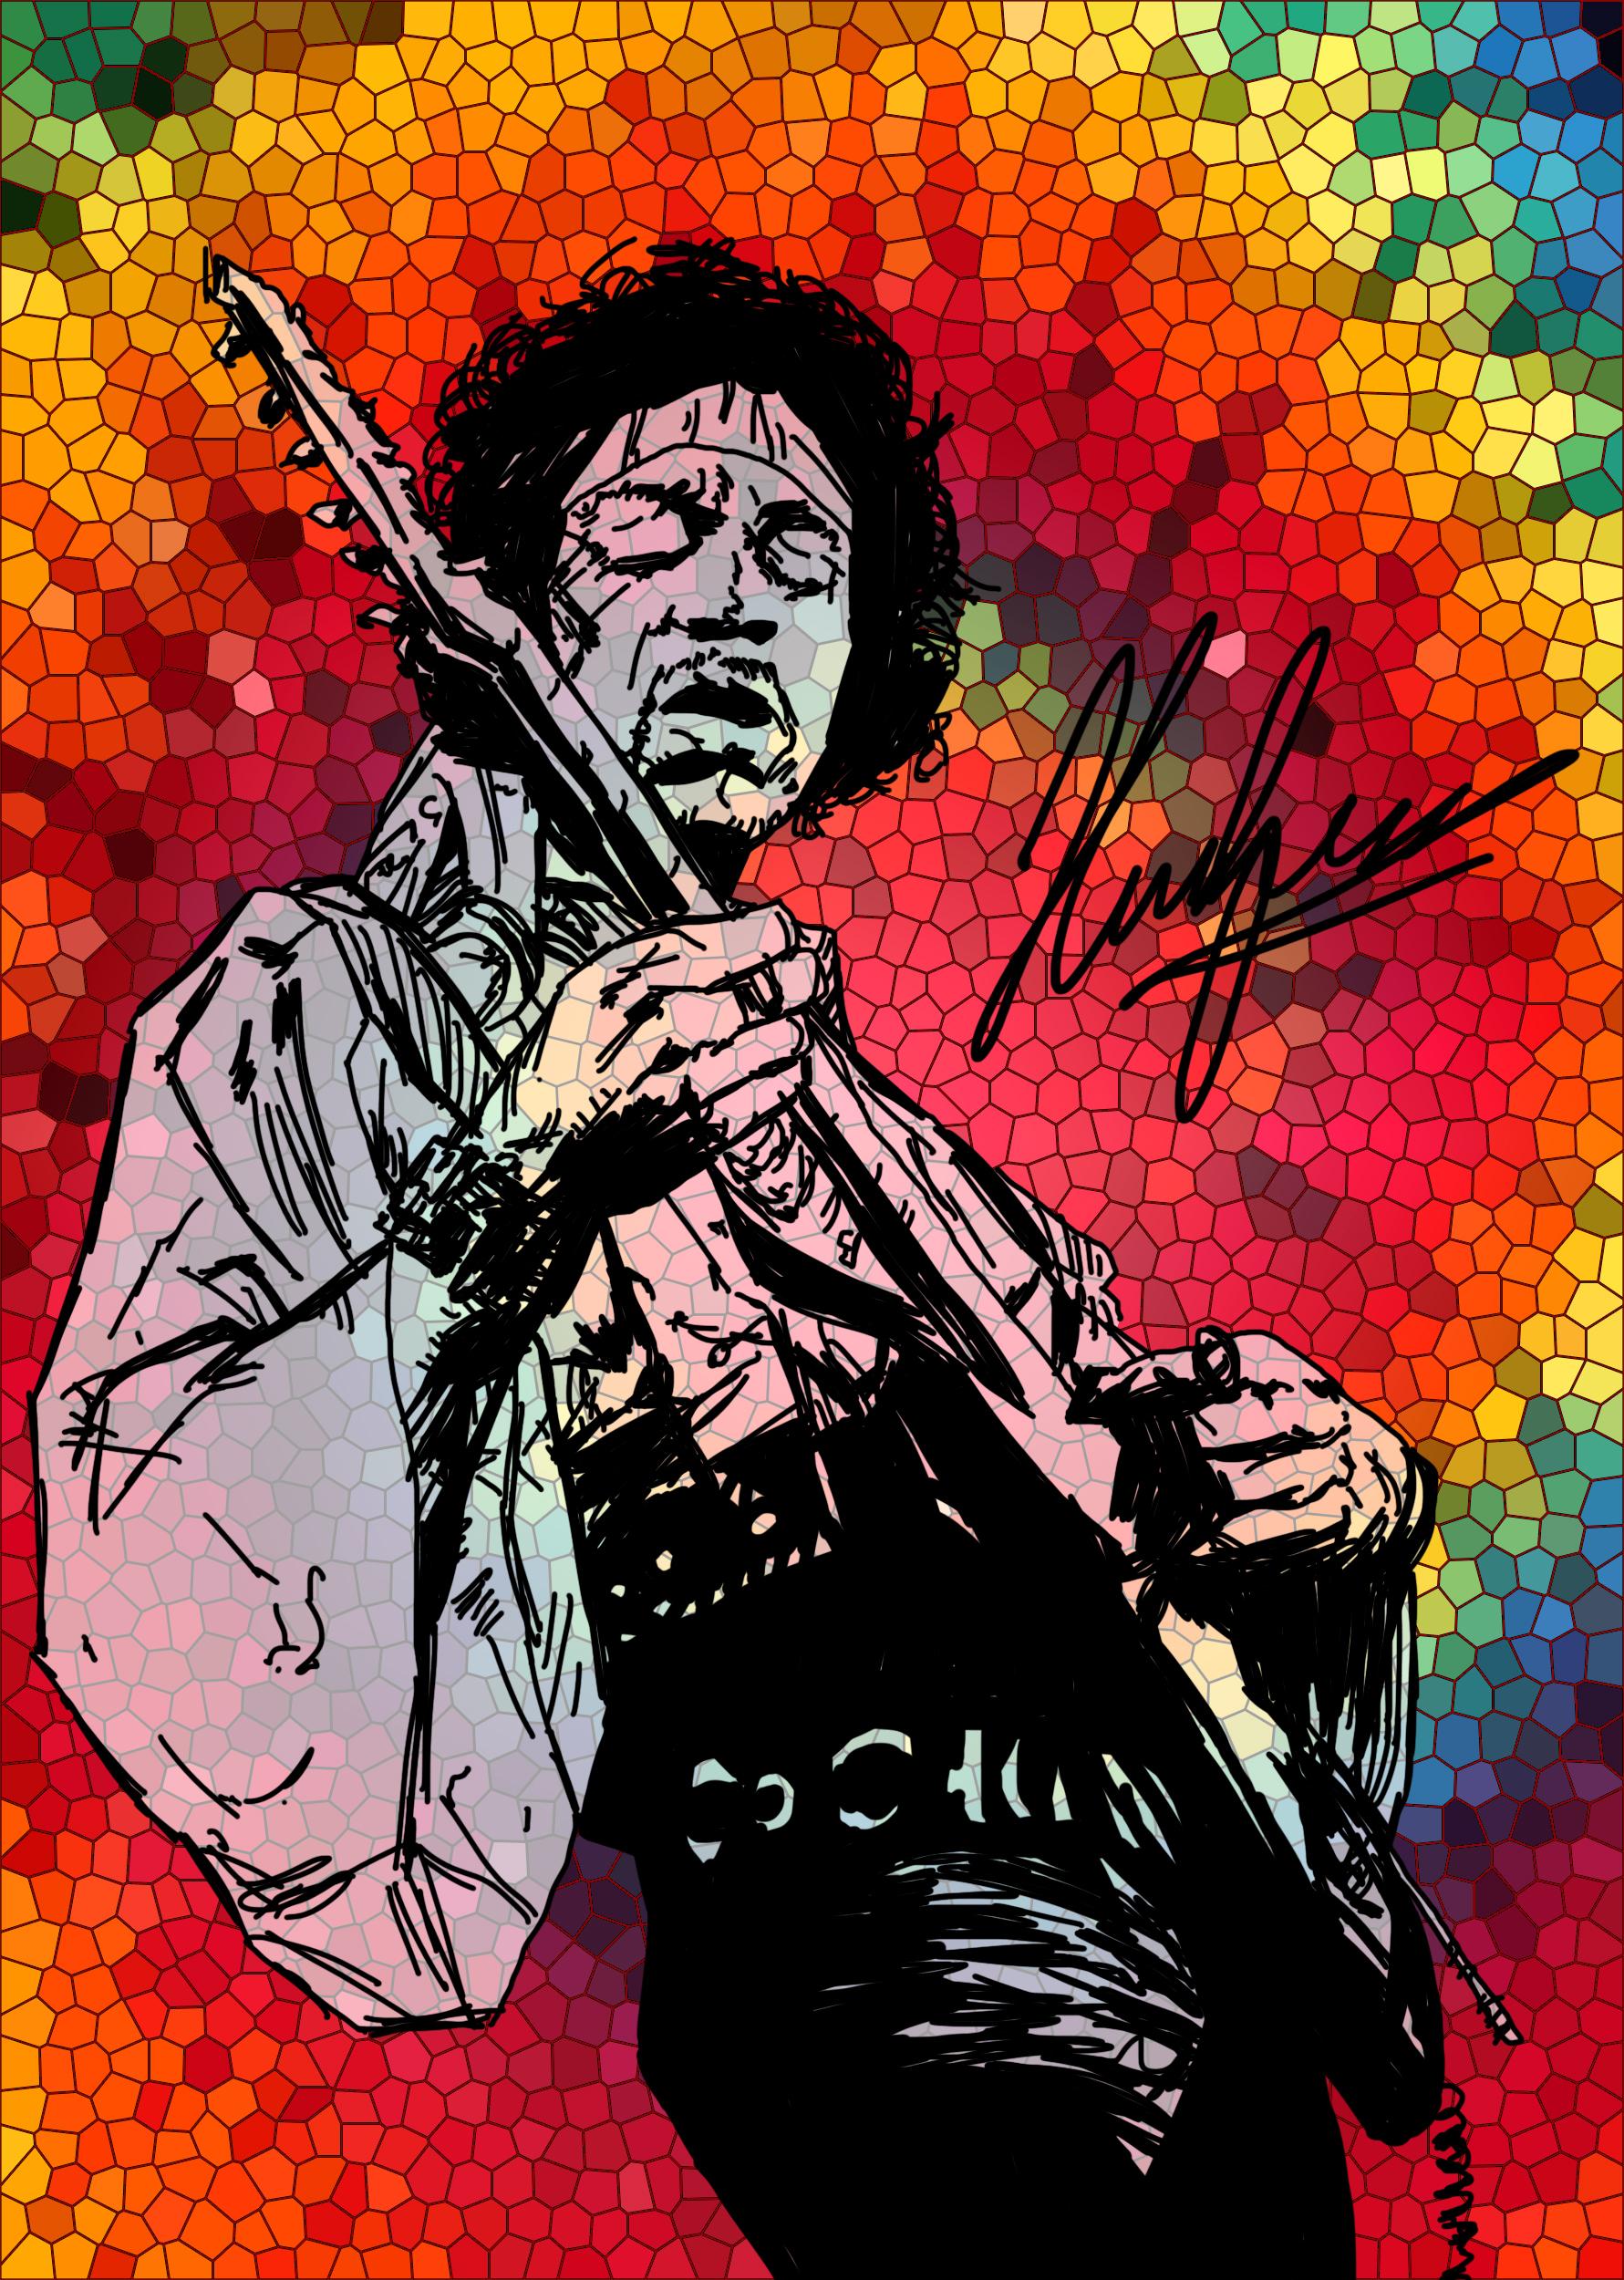 Jimi hendrix stained glass by neoyurin on deviantart - Jimi hendrix wallpaper psychedelic ...